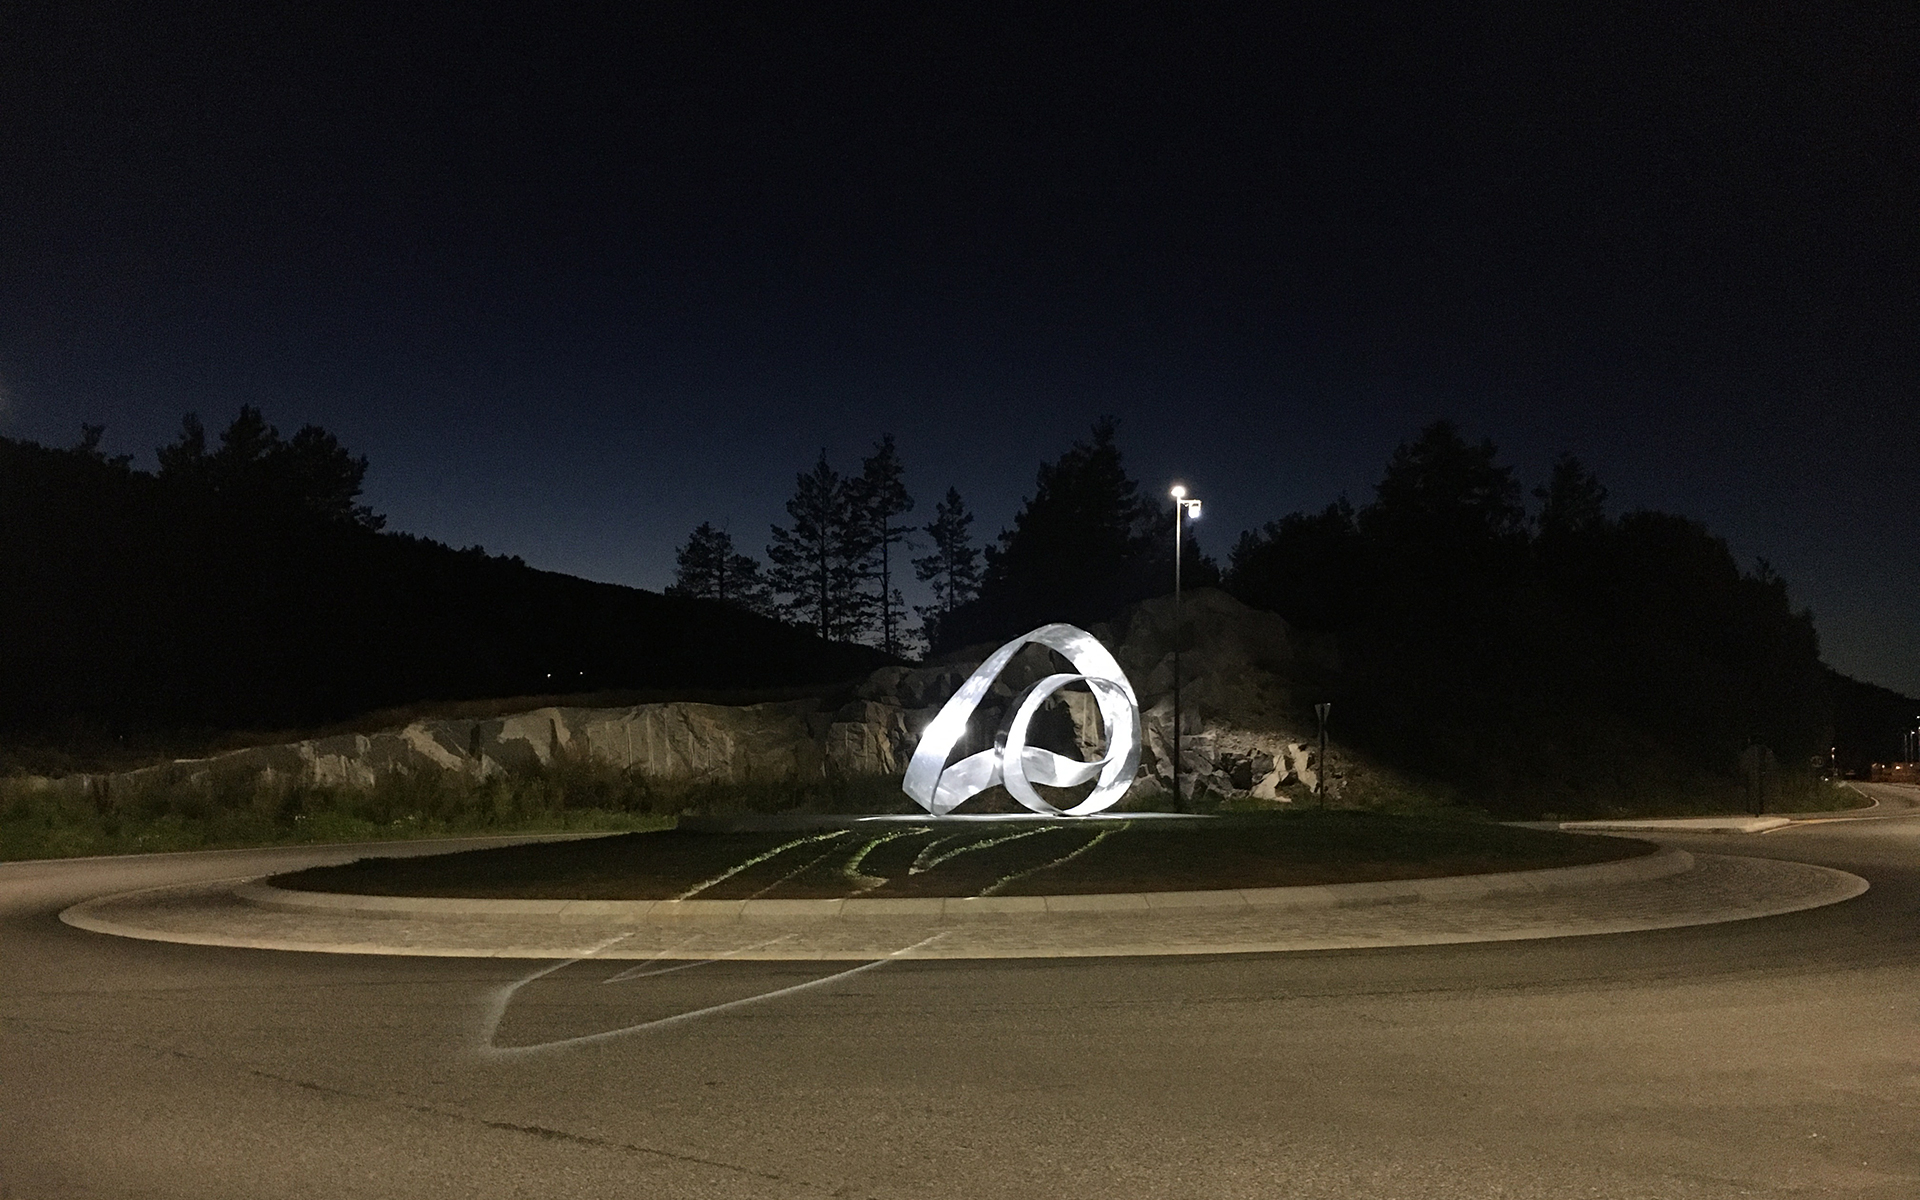 Moebius Variations - Upright Moebius at dusk. Light design by Halvor Næss Belysningsdesigner AS